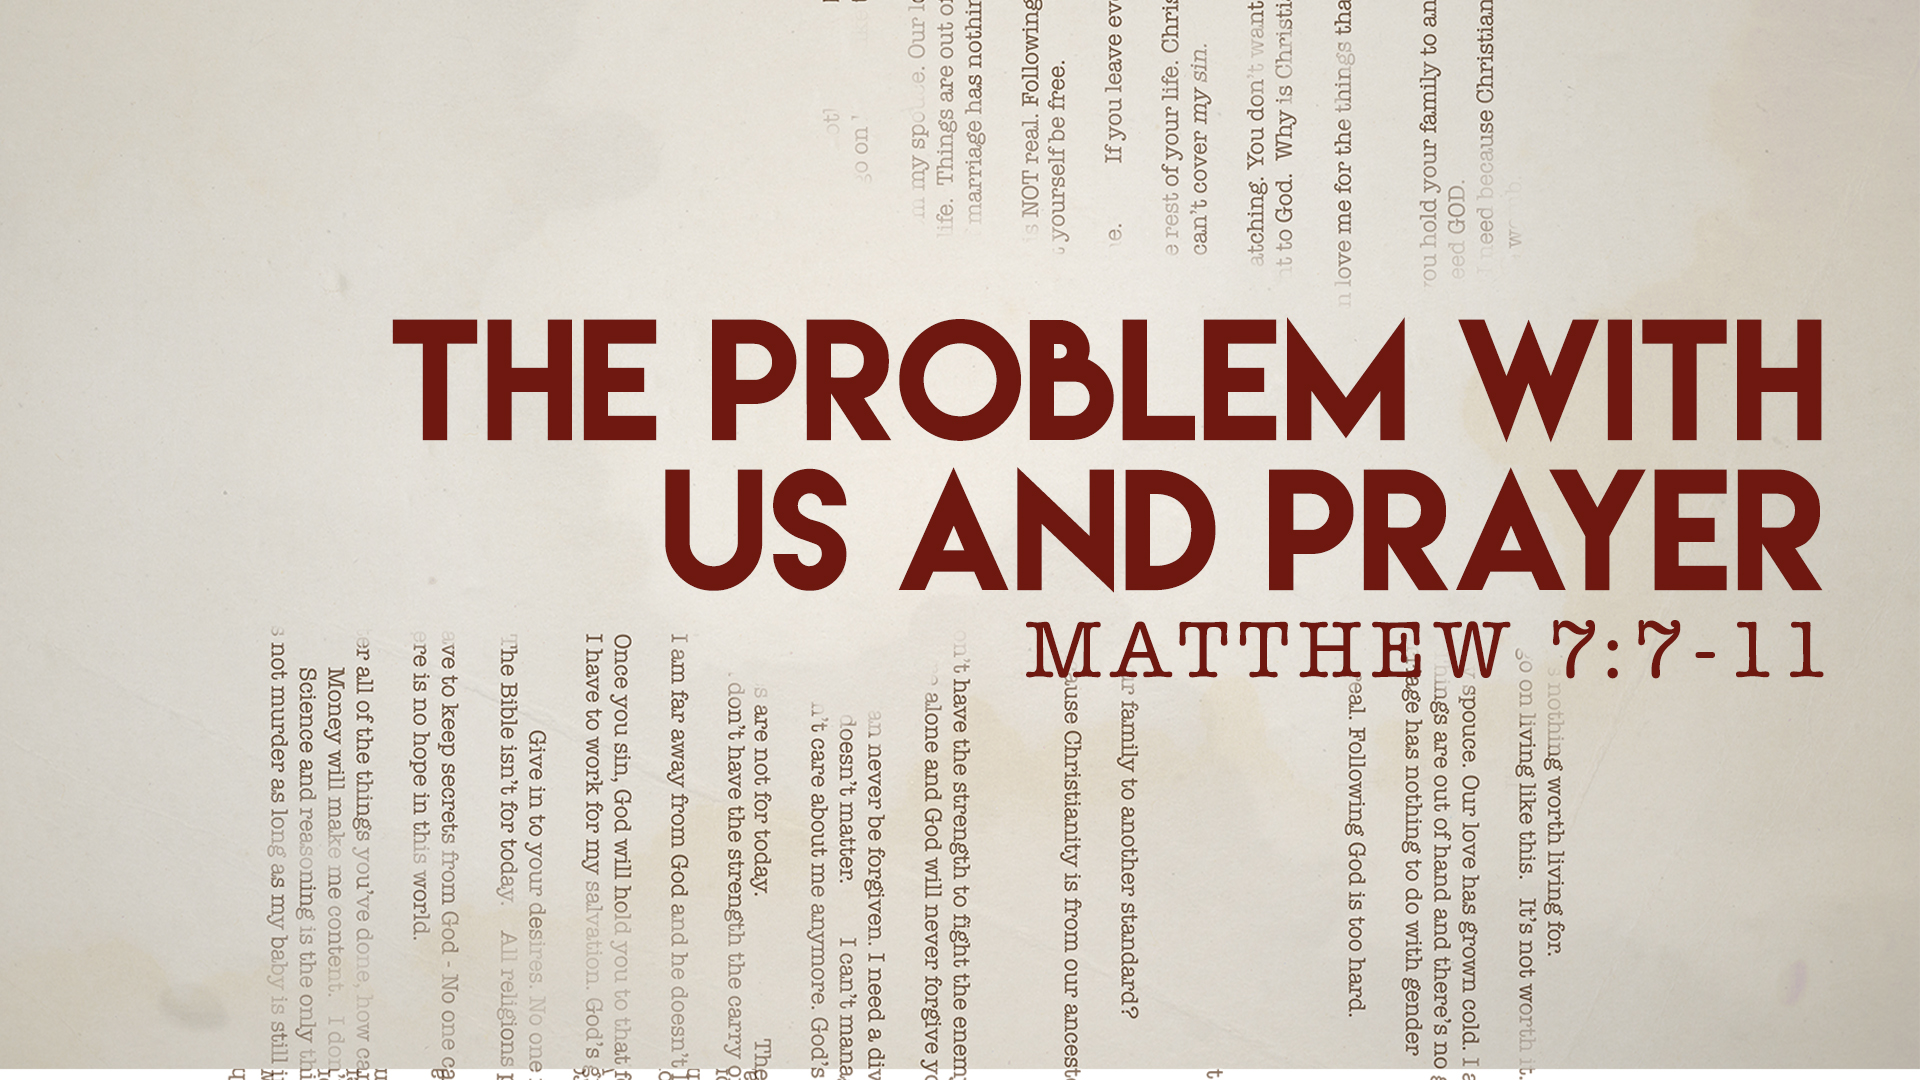 Matthew 7:7 - -11